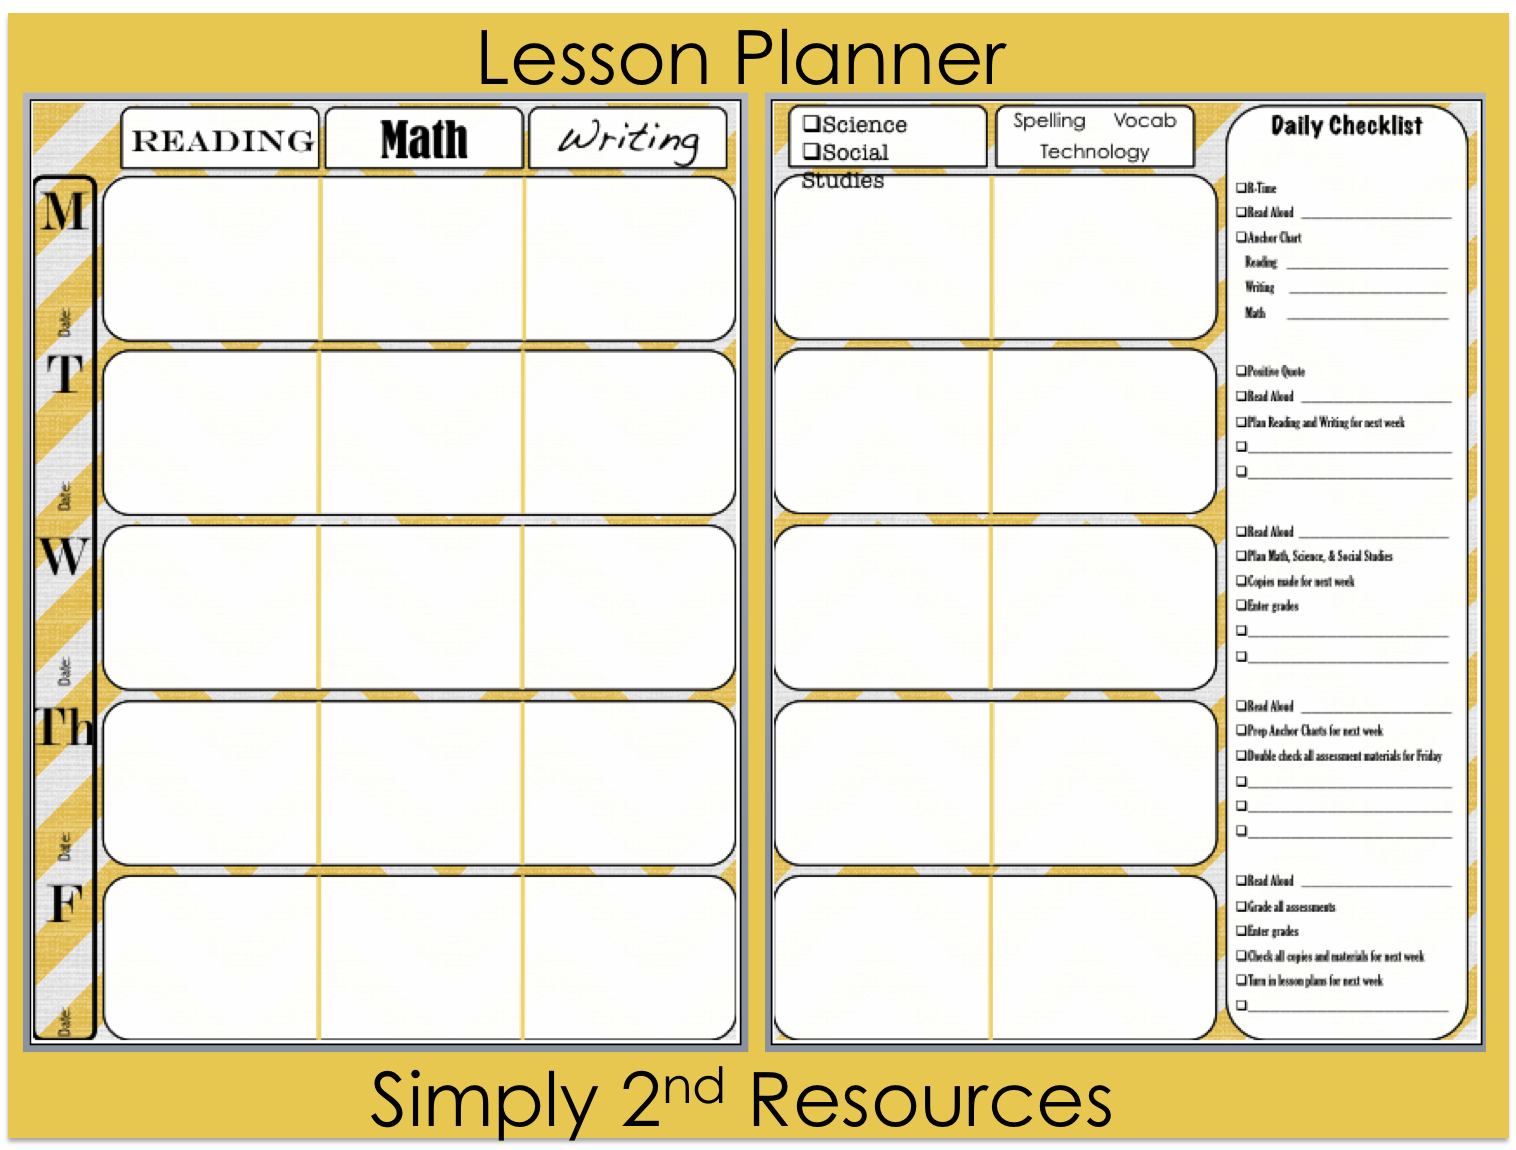 blank calendar lesson plans - calendar